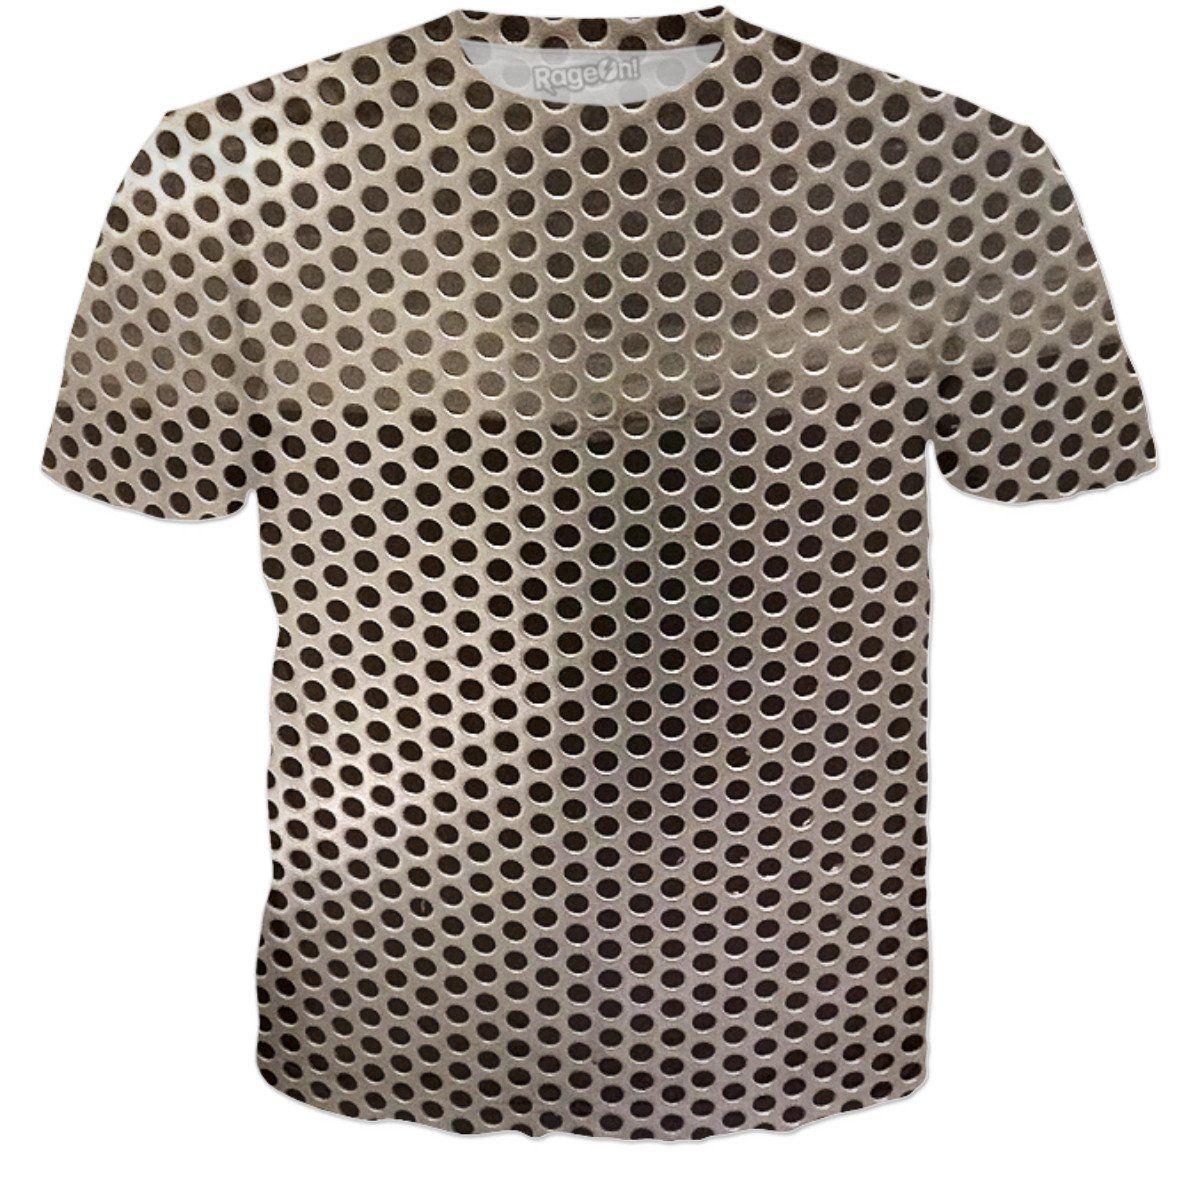 Steel mesh #metal #steel #iron #molding #clothingdesign #clothingline #sterlingvisions #podcast #merch #art